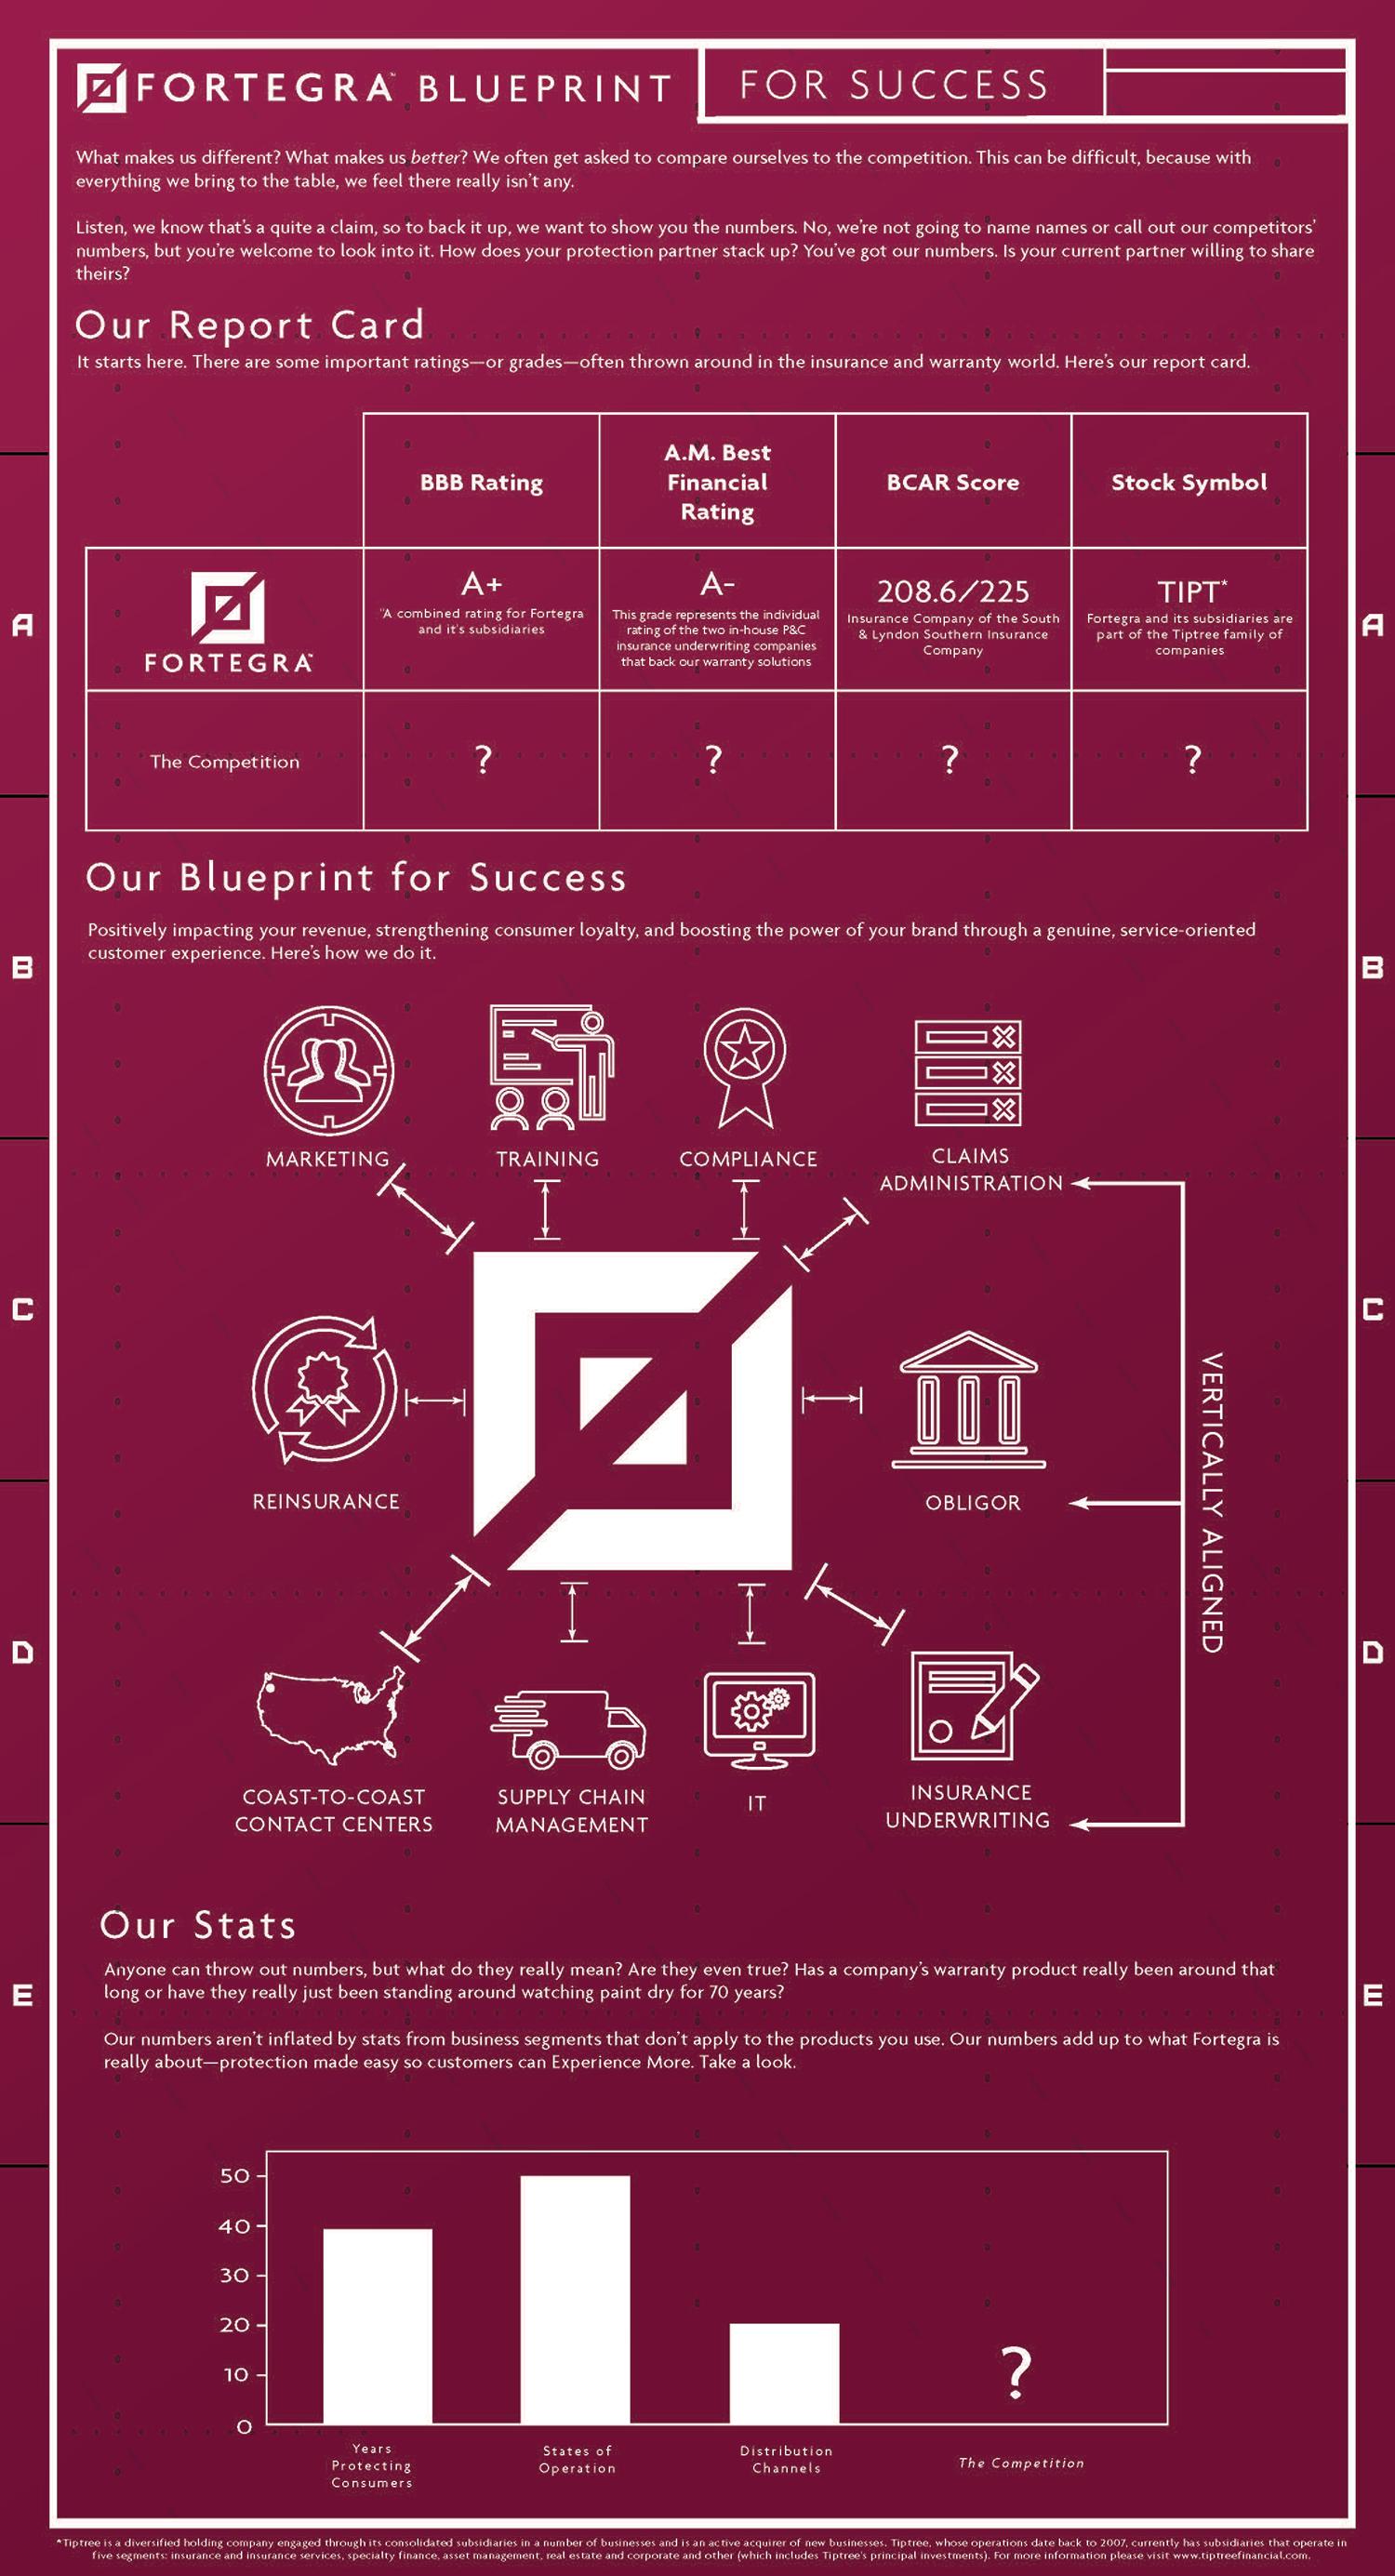 Fortegra_Blueprint_Infographic.jpeg